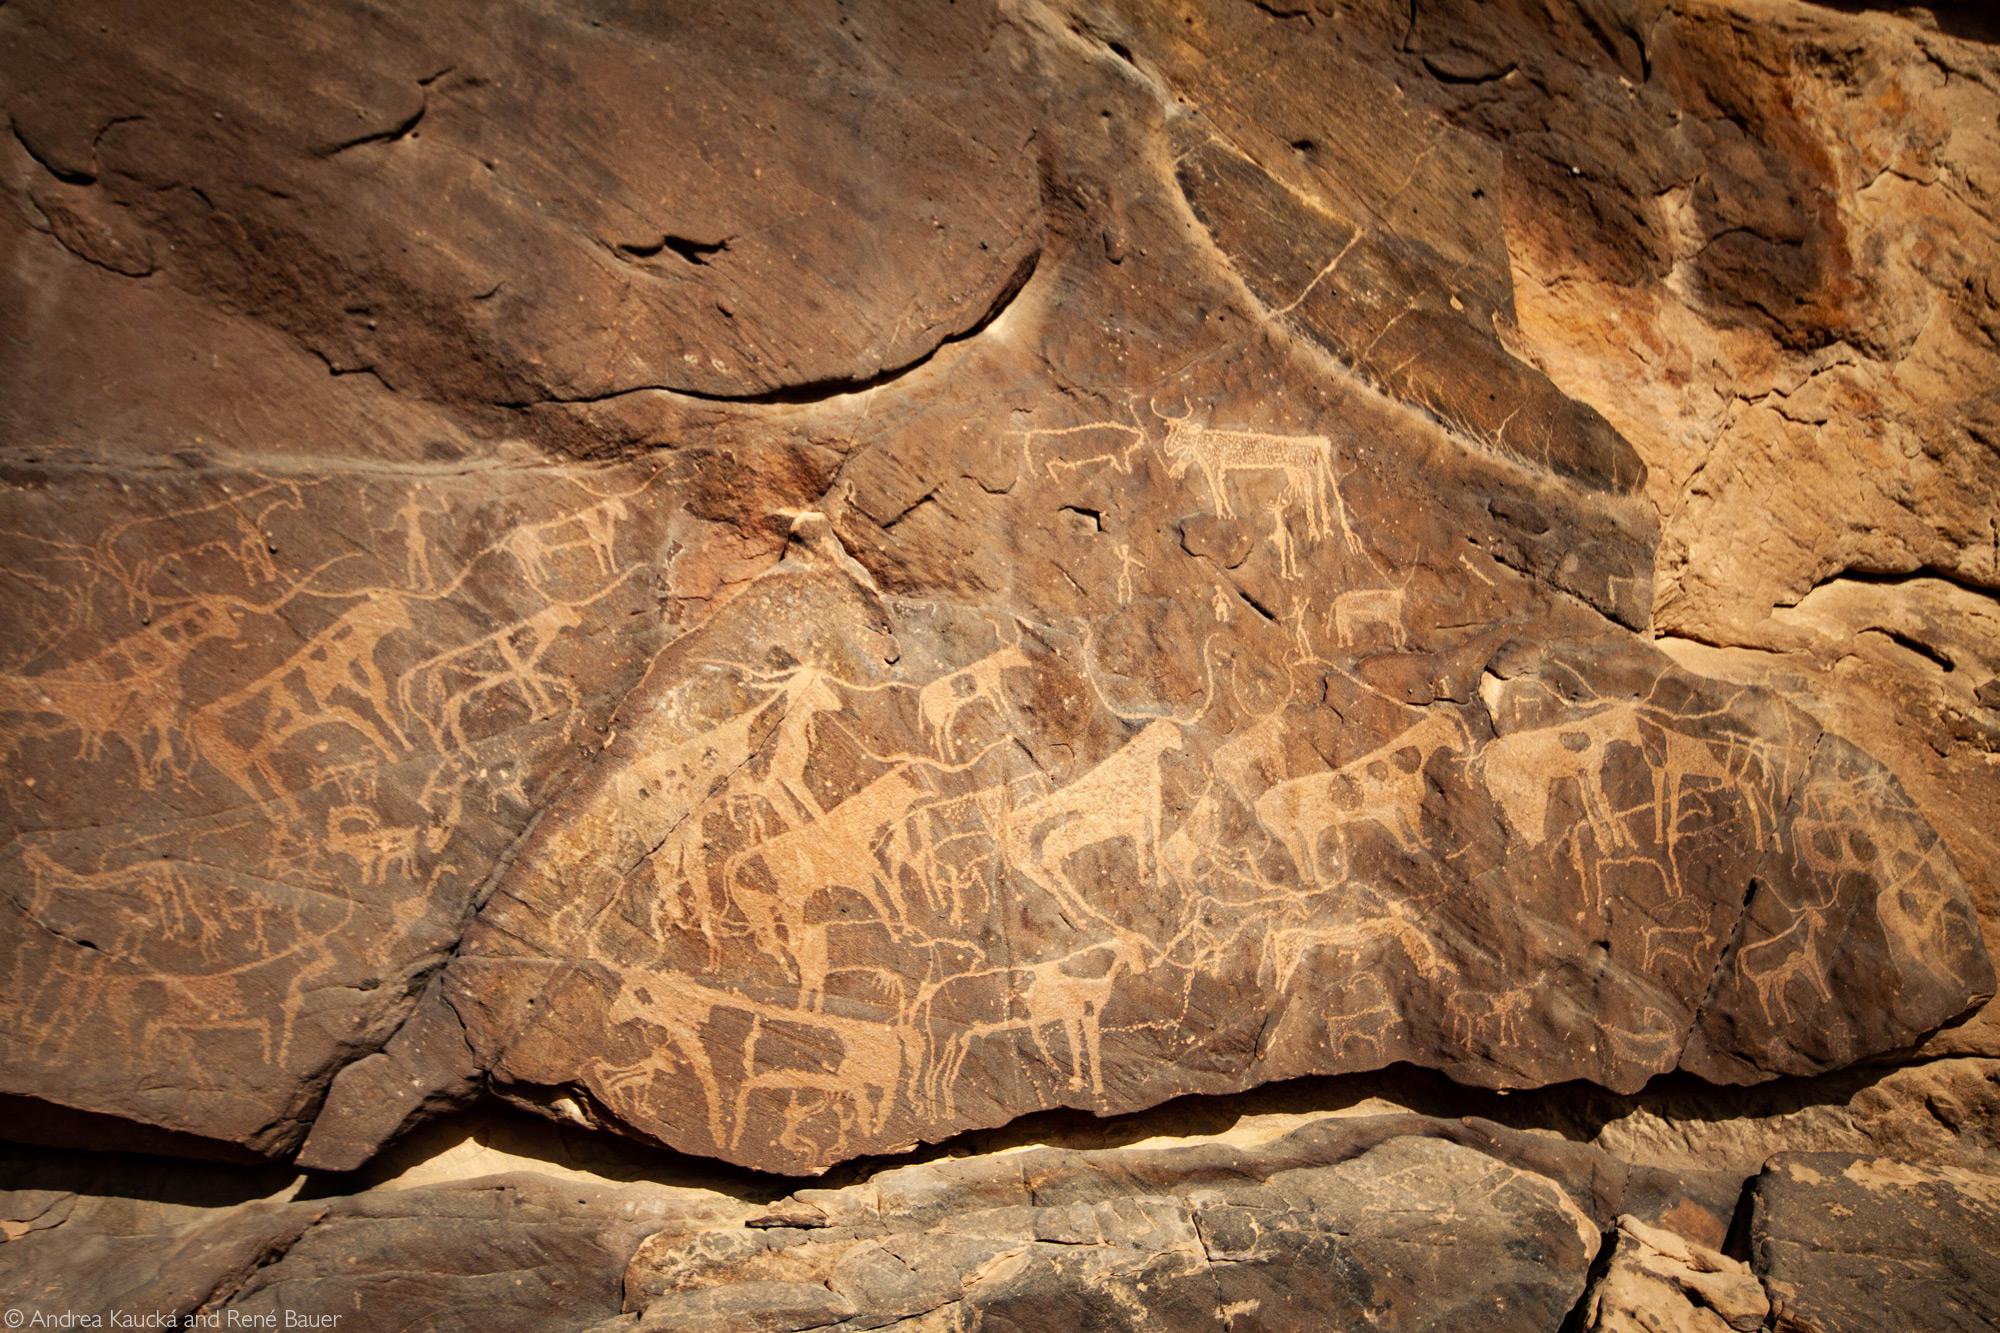 Pertroglyphs at Bir Nurayet of longhorn cattle, Sudan © Andrea Kaucká and René Bauer